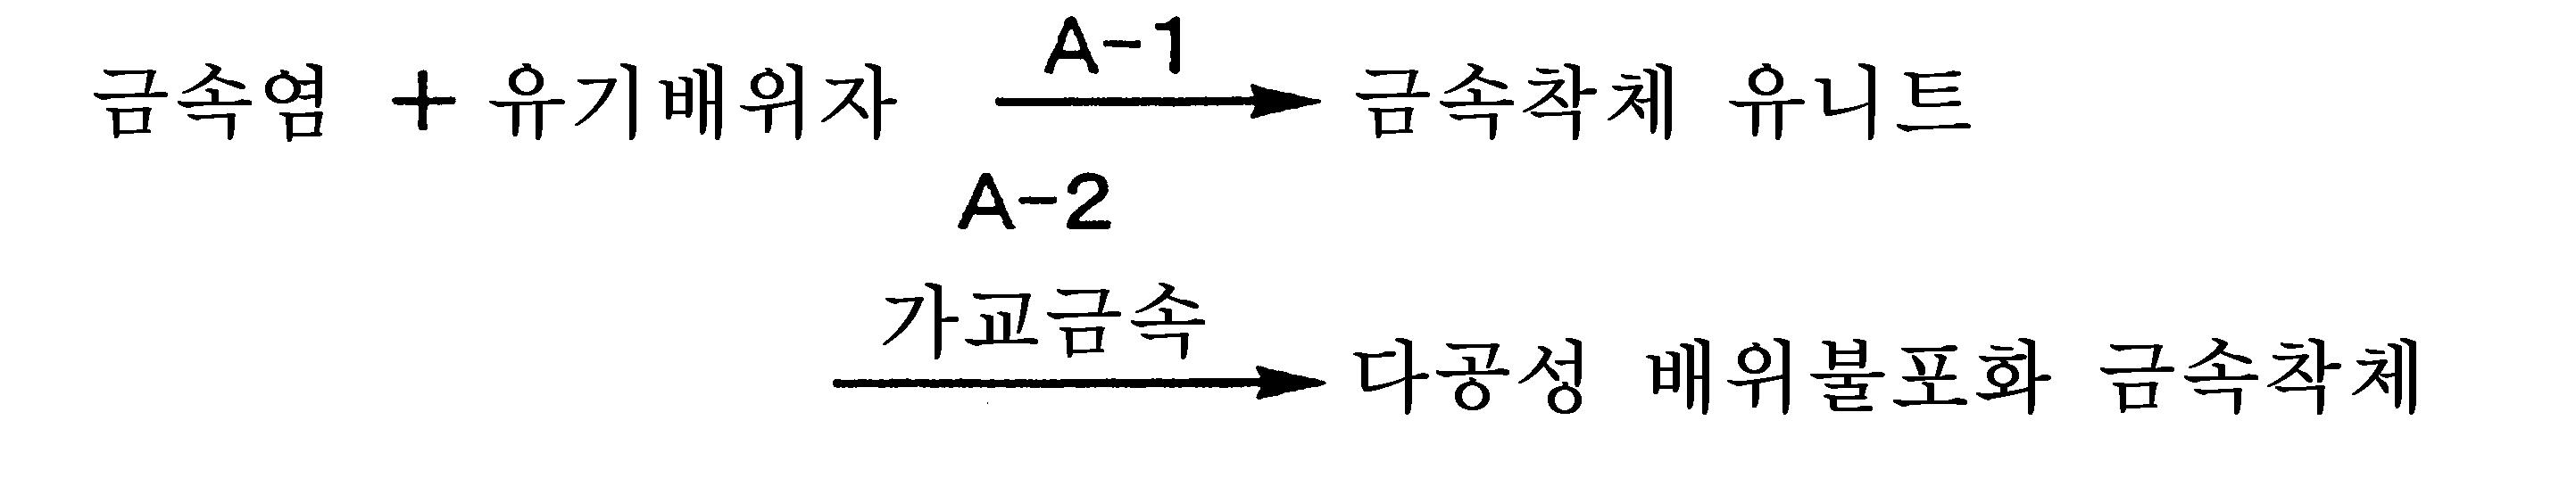 Figure 112003016236117-pat00011